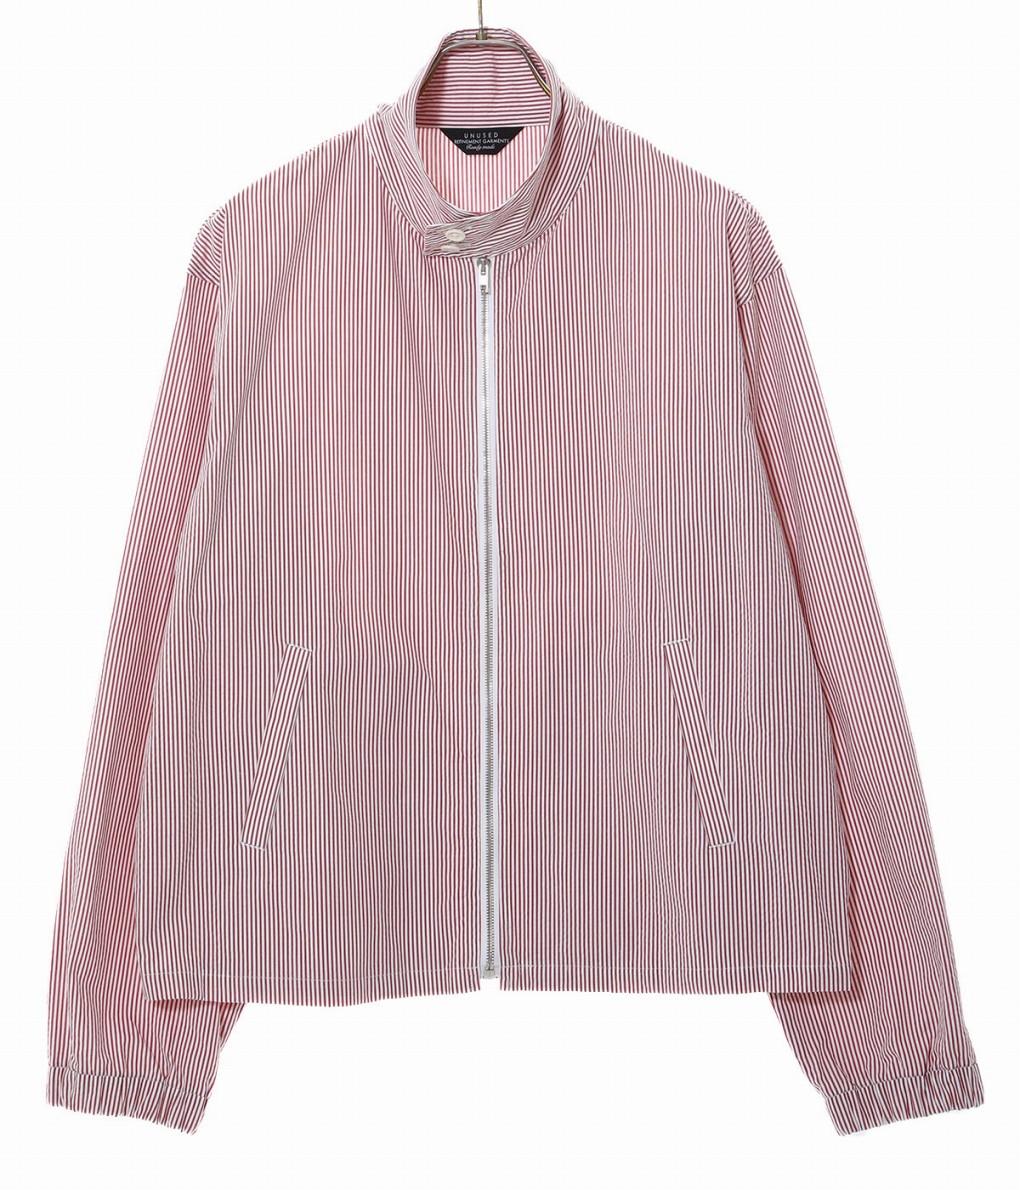 UNUSED / アンユーズド : Stripe cotton jacket : ストライプコットンジャケット ジャケット メンズ : US1564 【NOA】